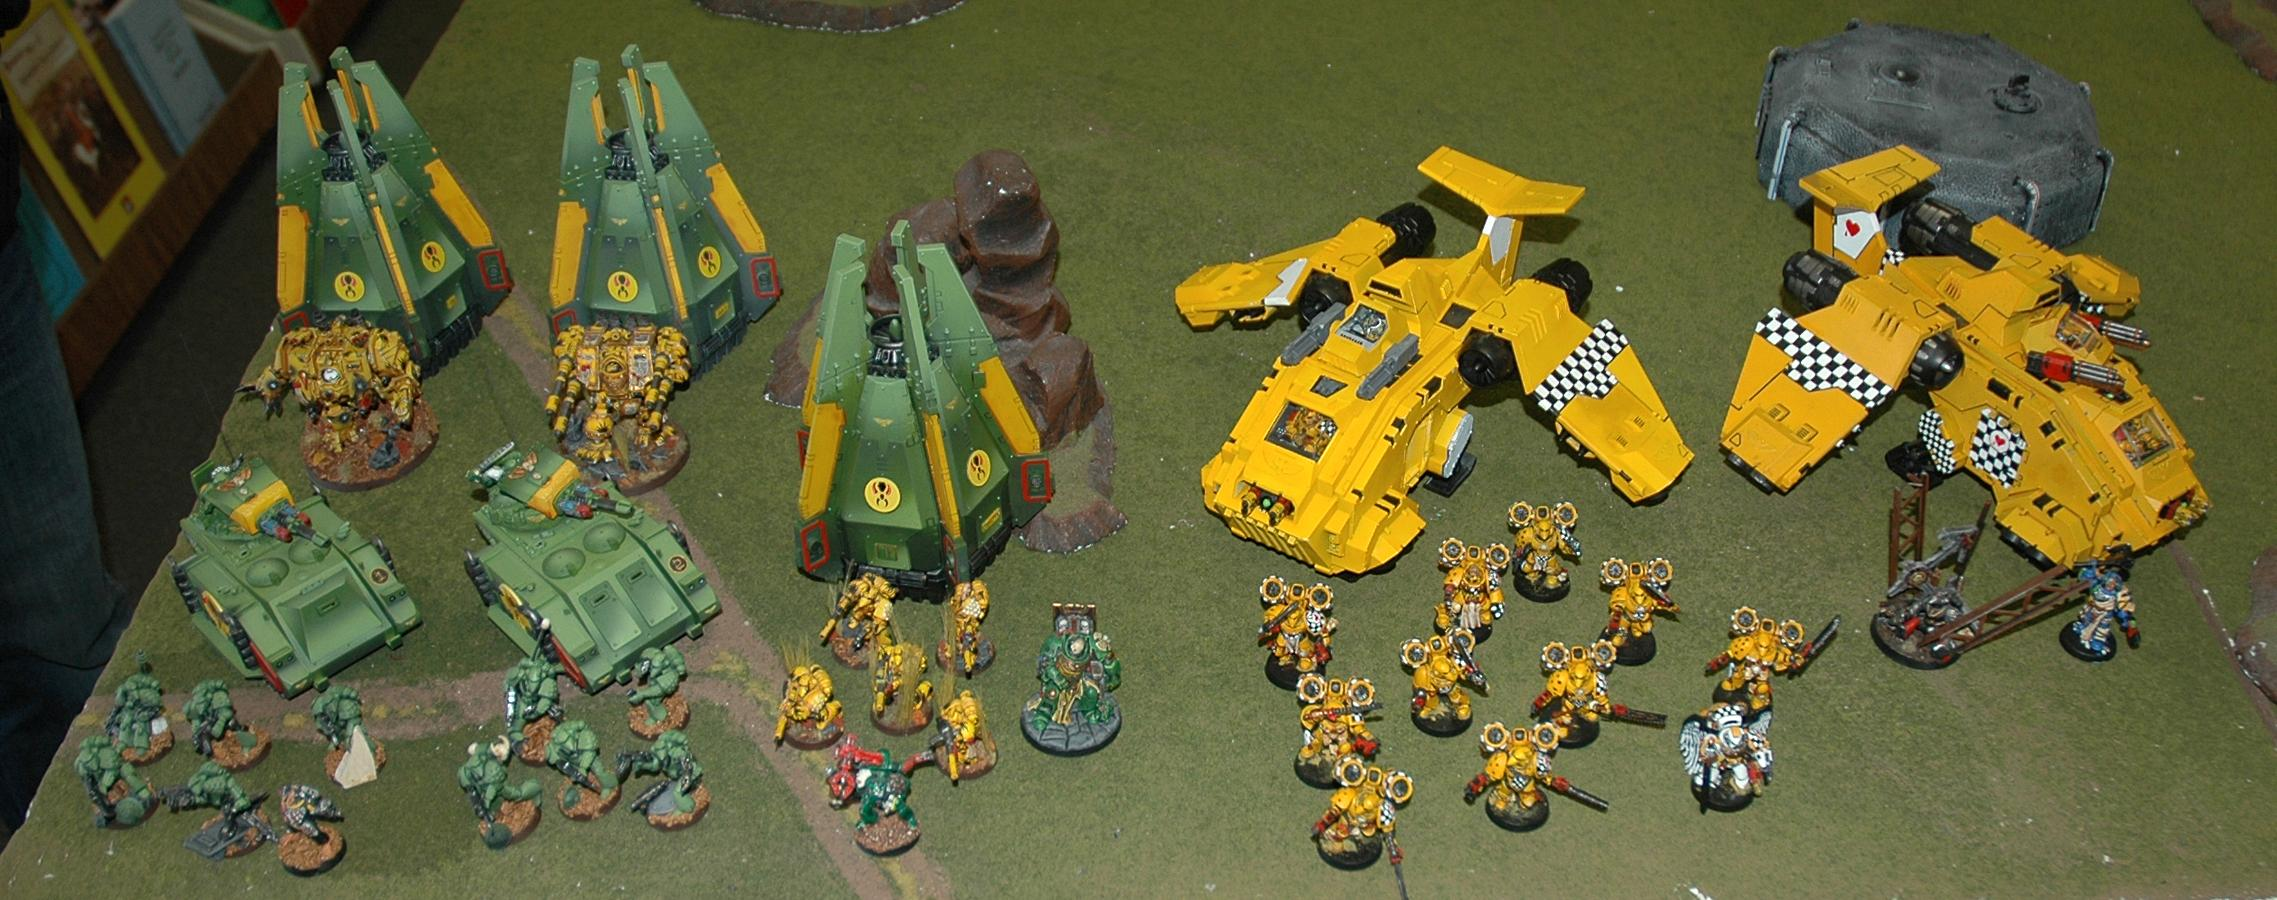 Lamenters, Mantis Warriors, Space Marines, Warhammer 40,000